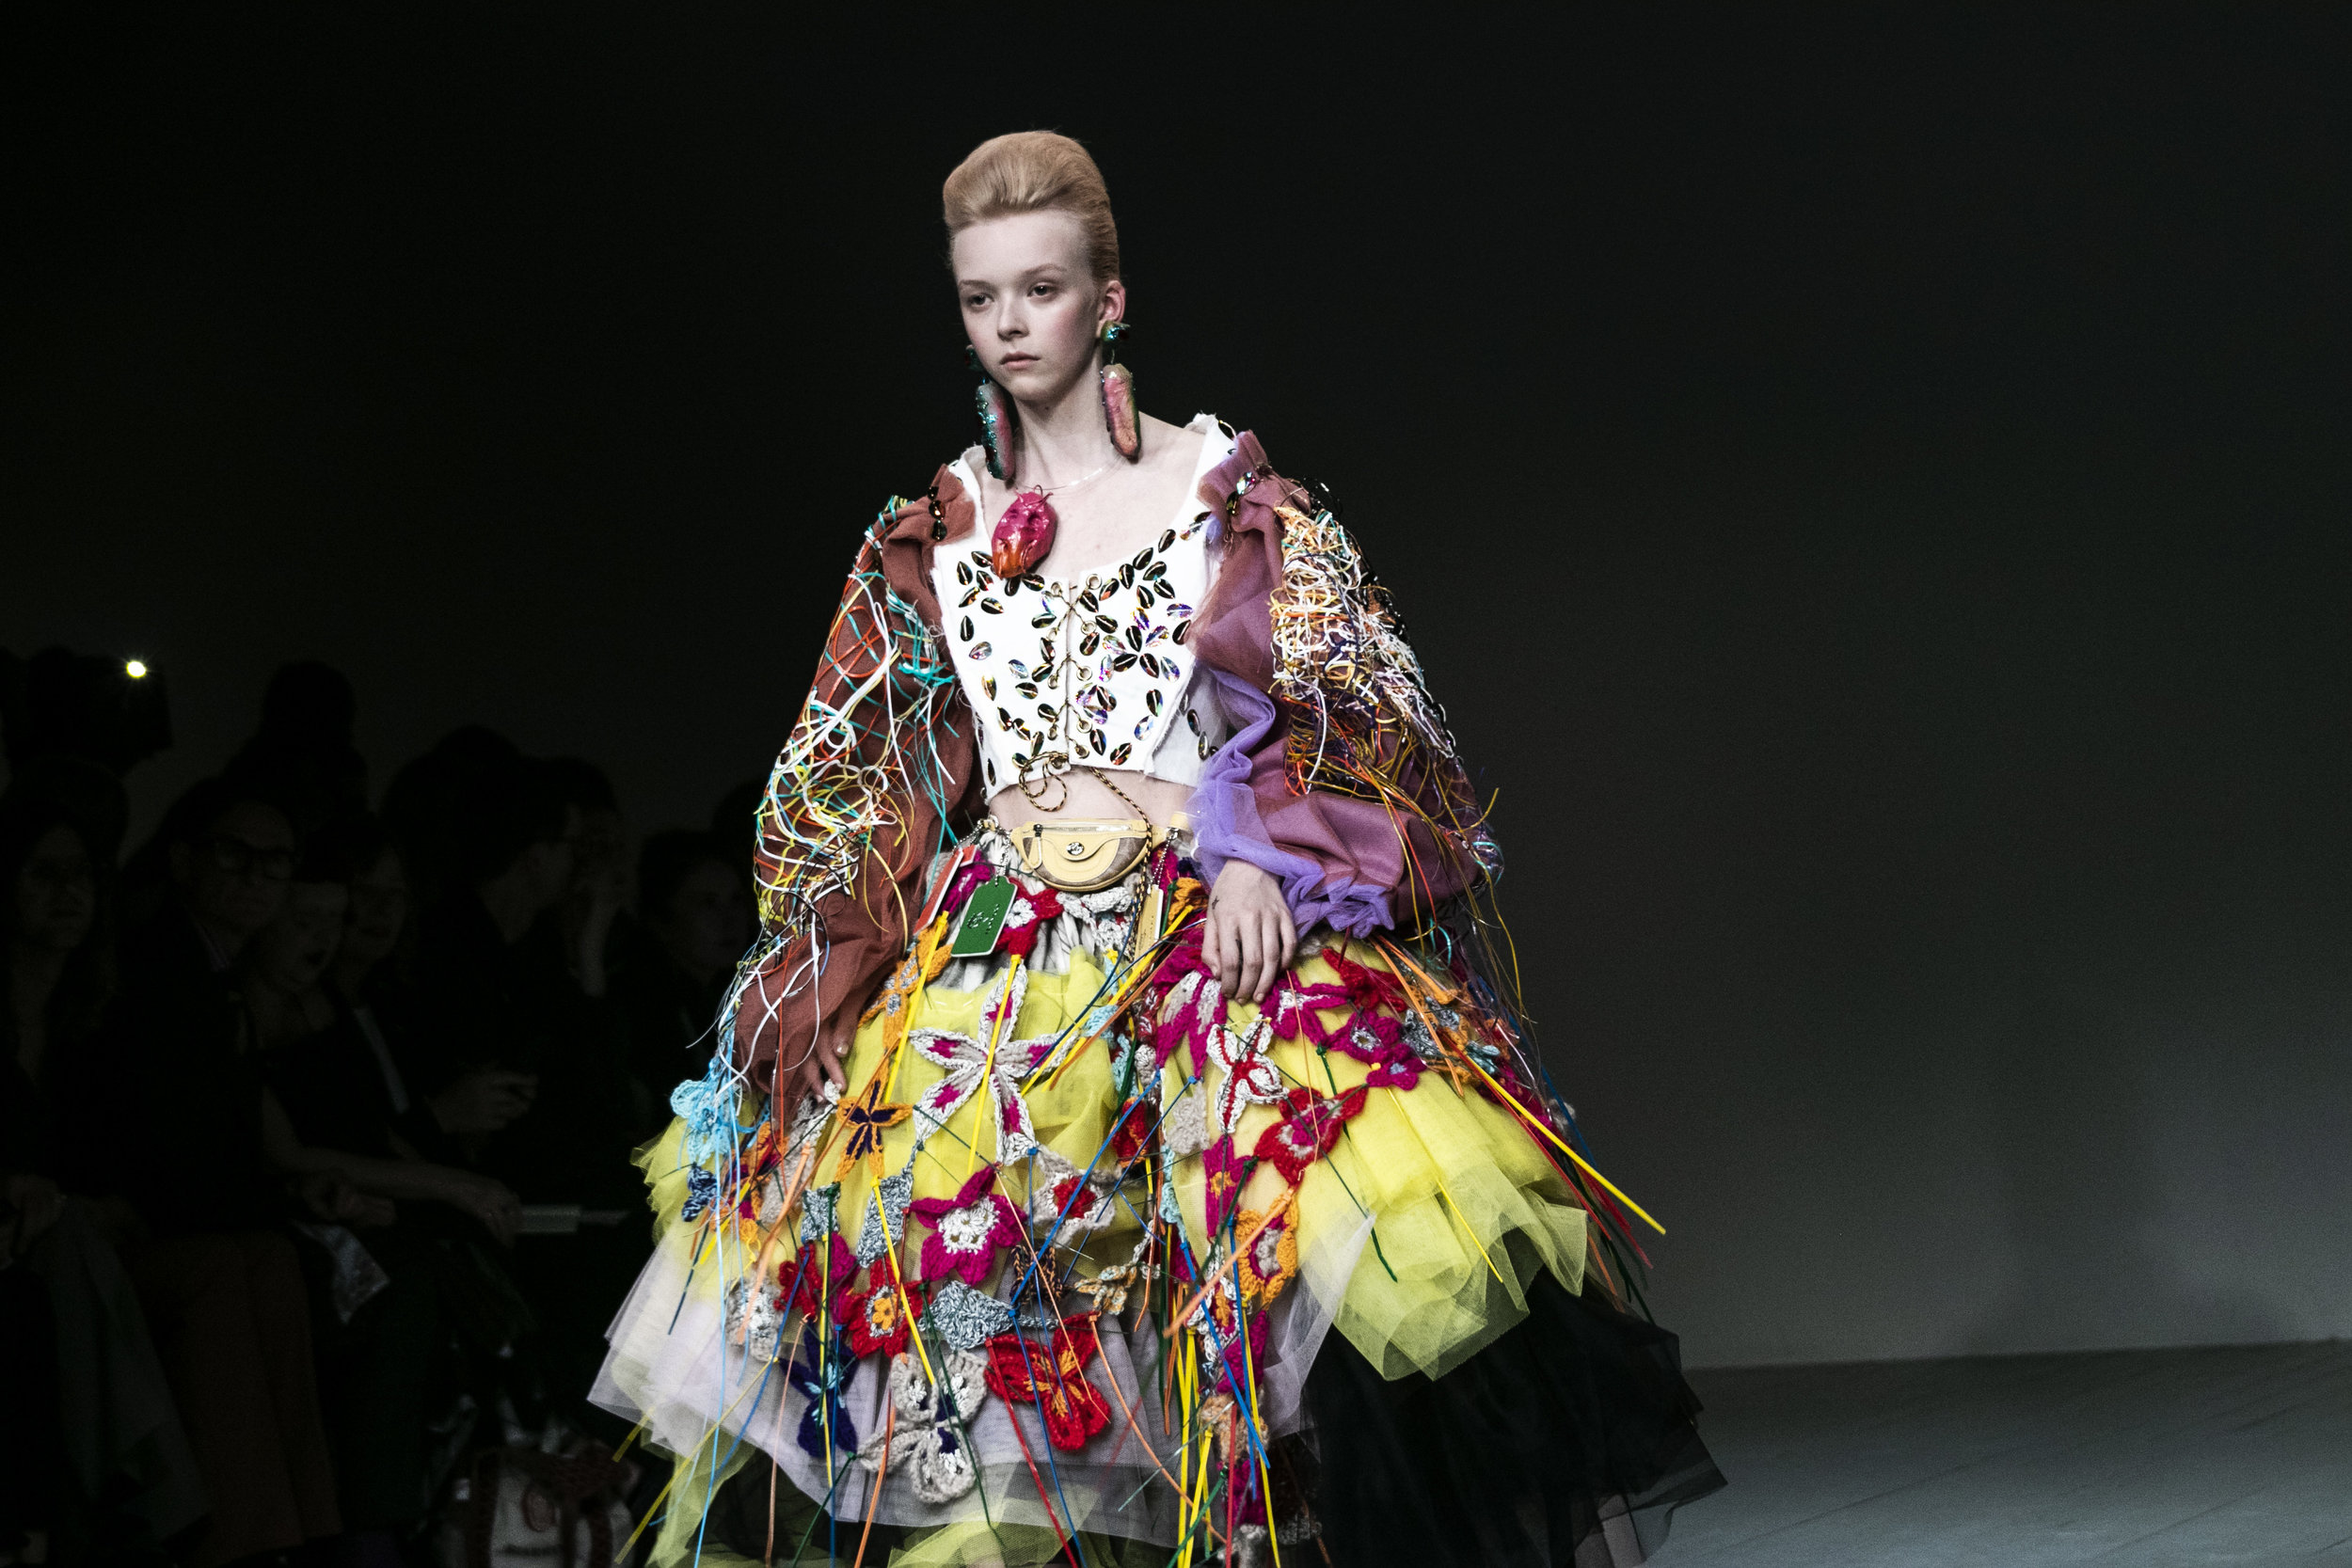 Matty Bovan London Fashion Week SS19 Adorngirl 9.jpg